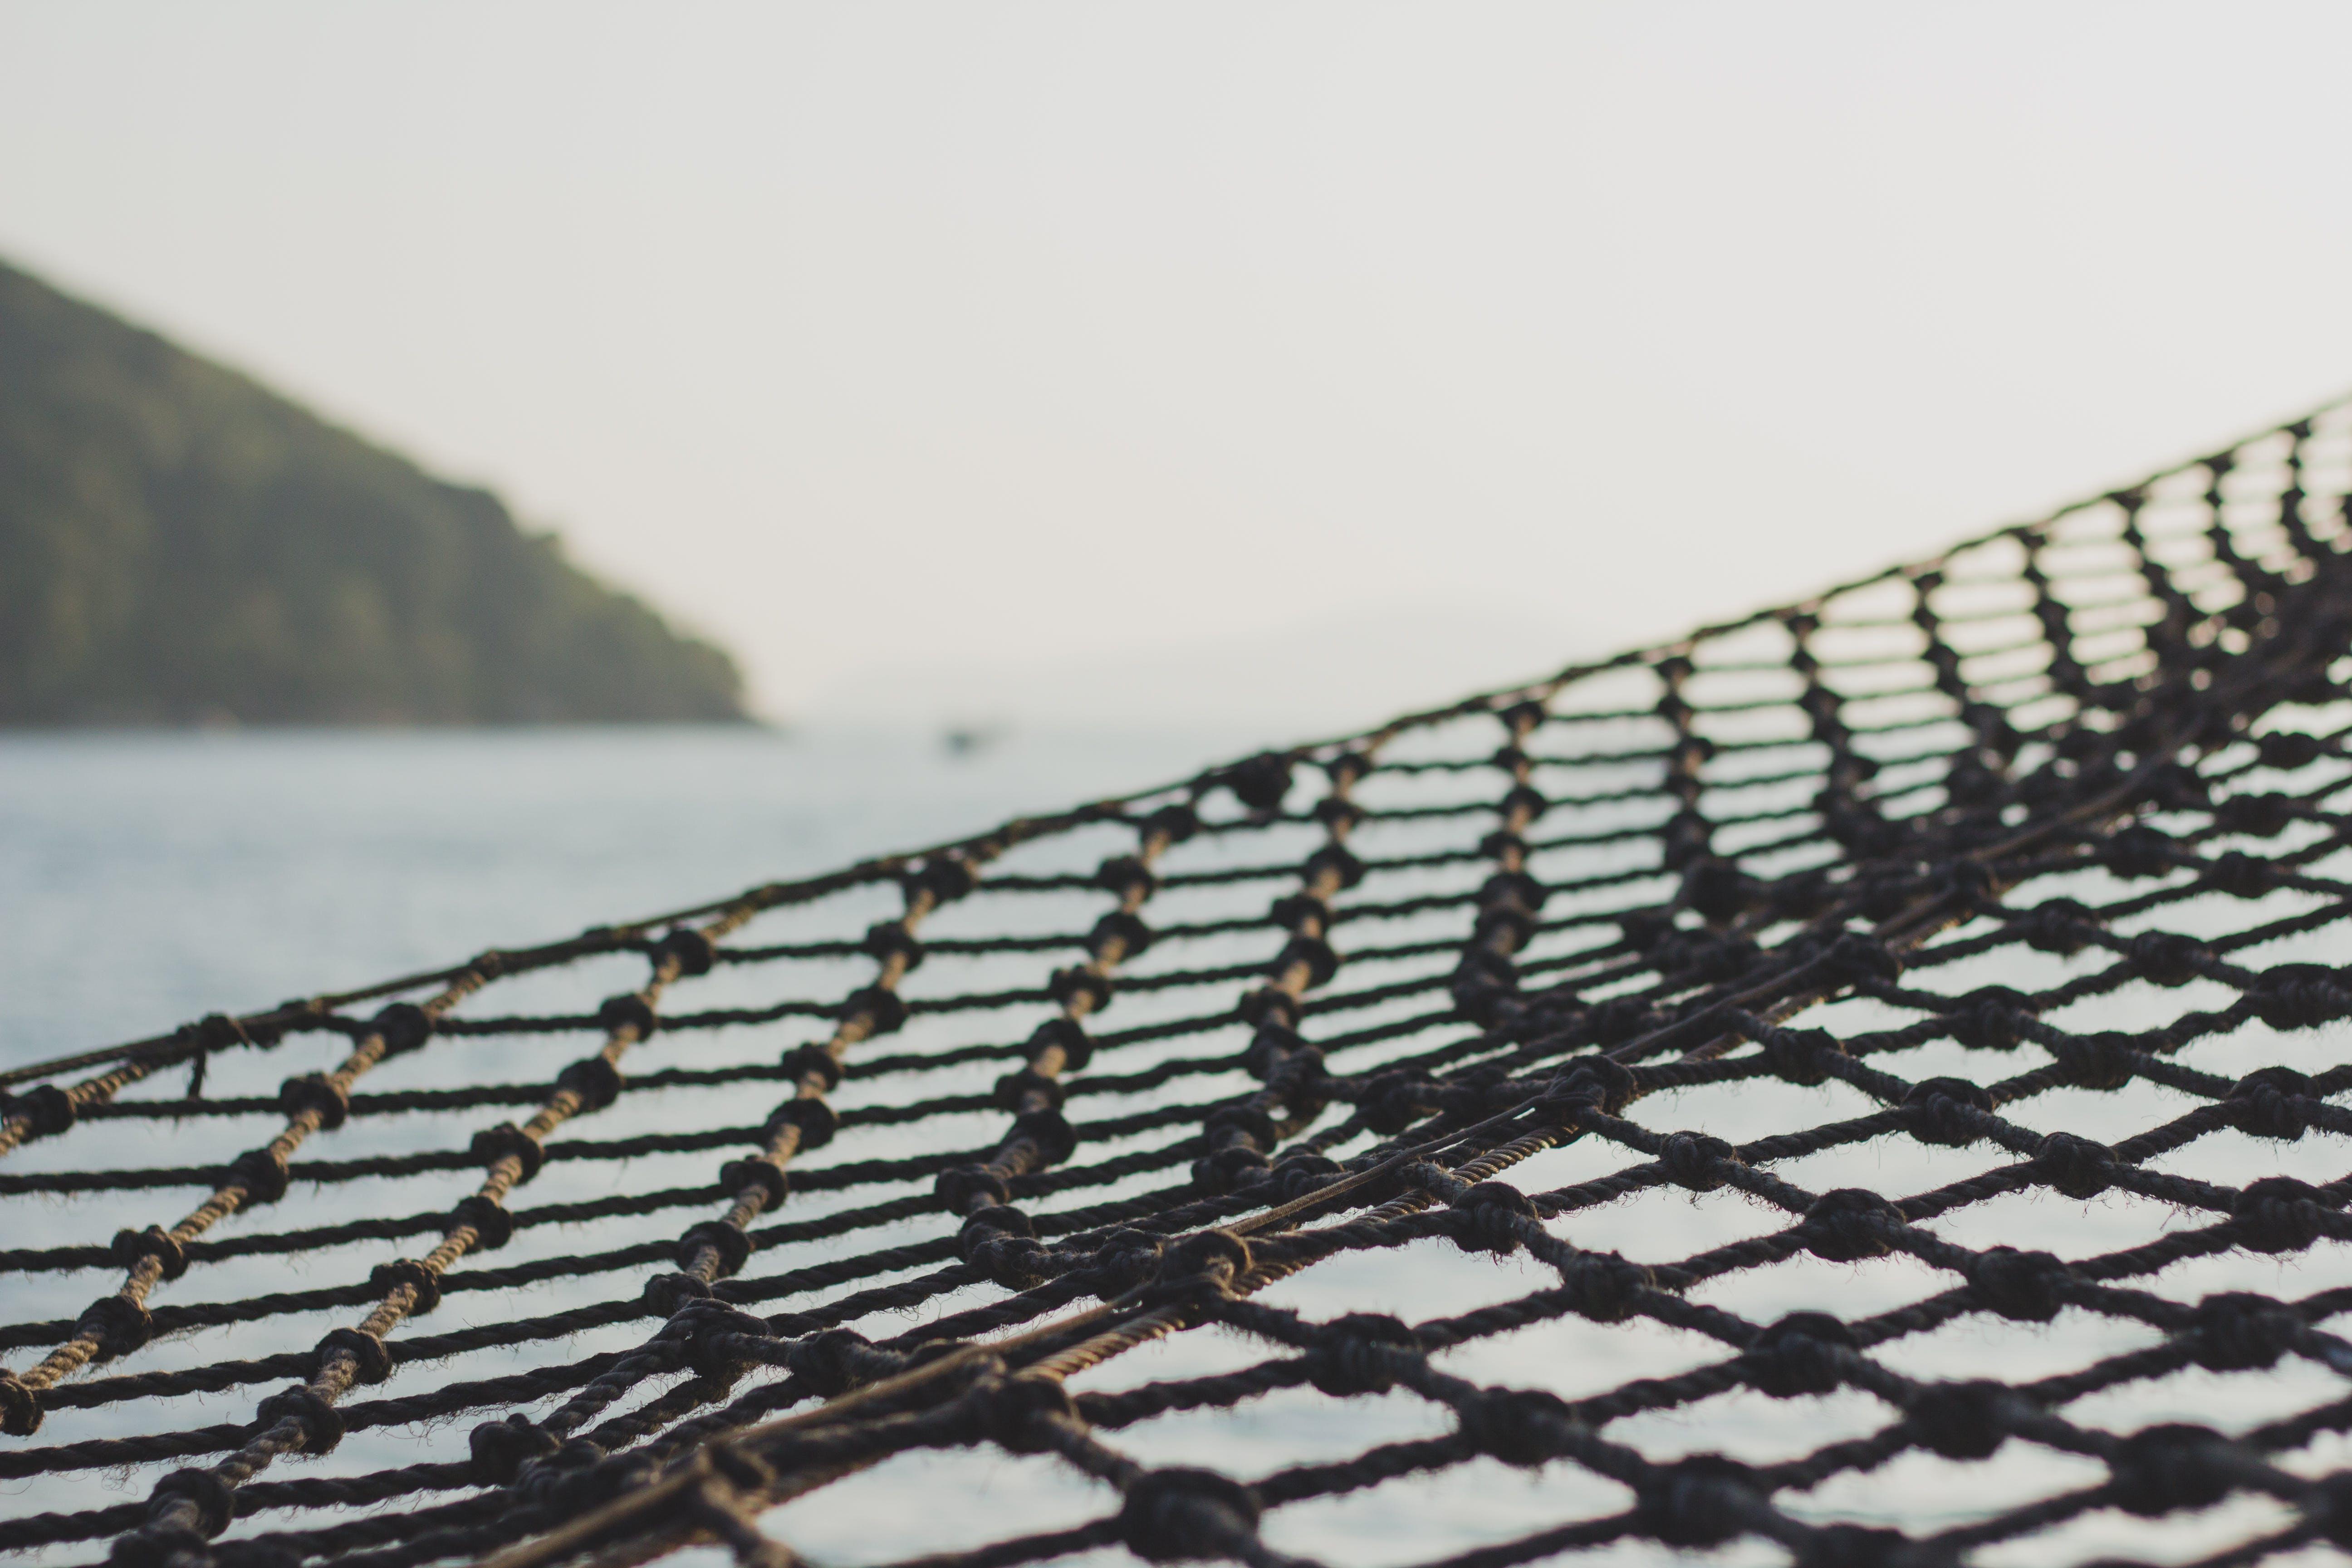 Free stock photo of sea, boat, network